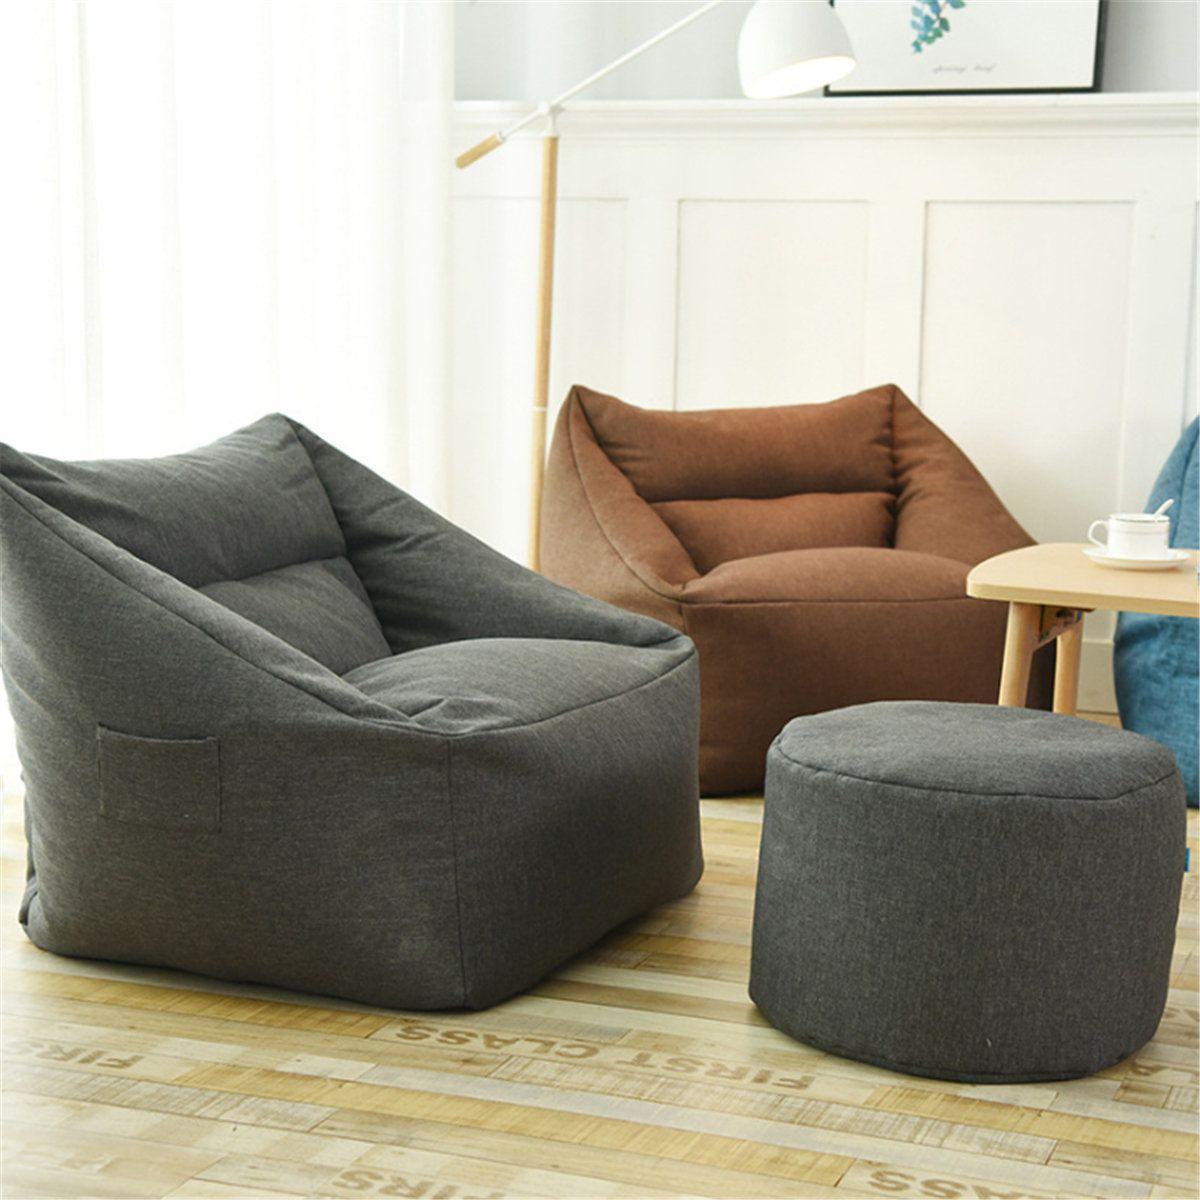 Waterproof Bean Bag Lazy Sofa Indoor Seat Chair Cover Beanbag Sofas Large Bean Bag Cover Armchair